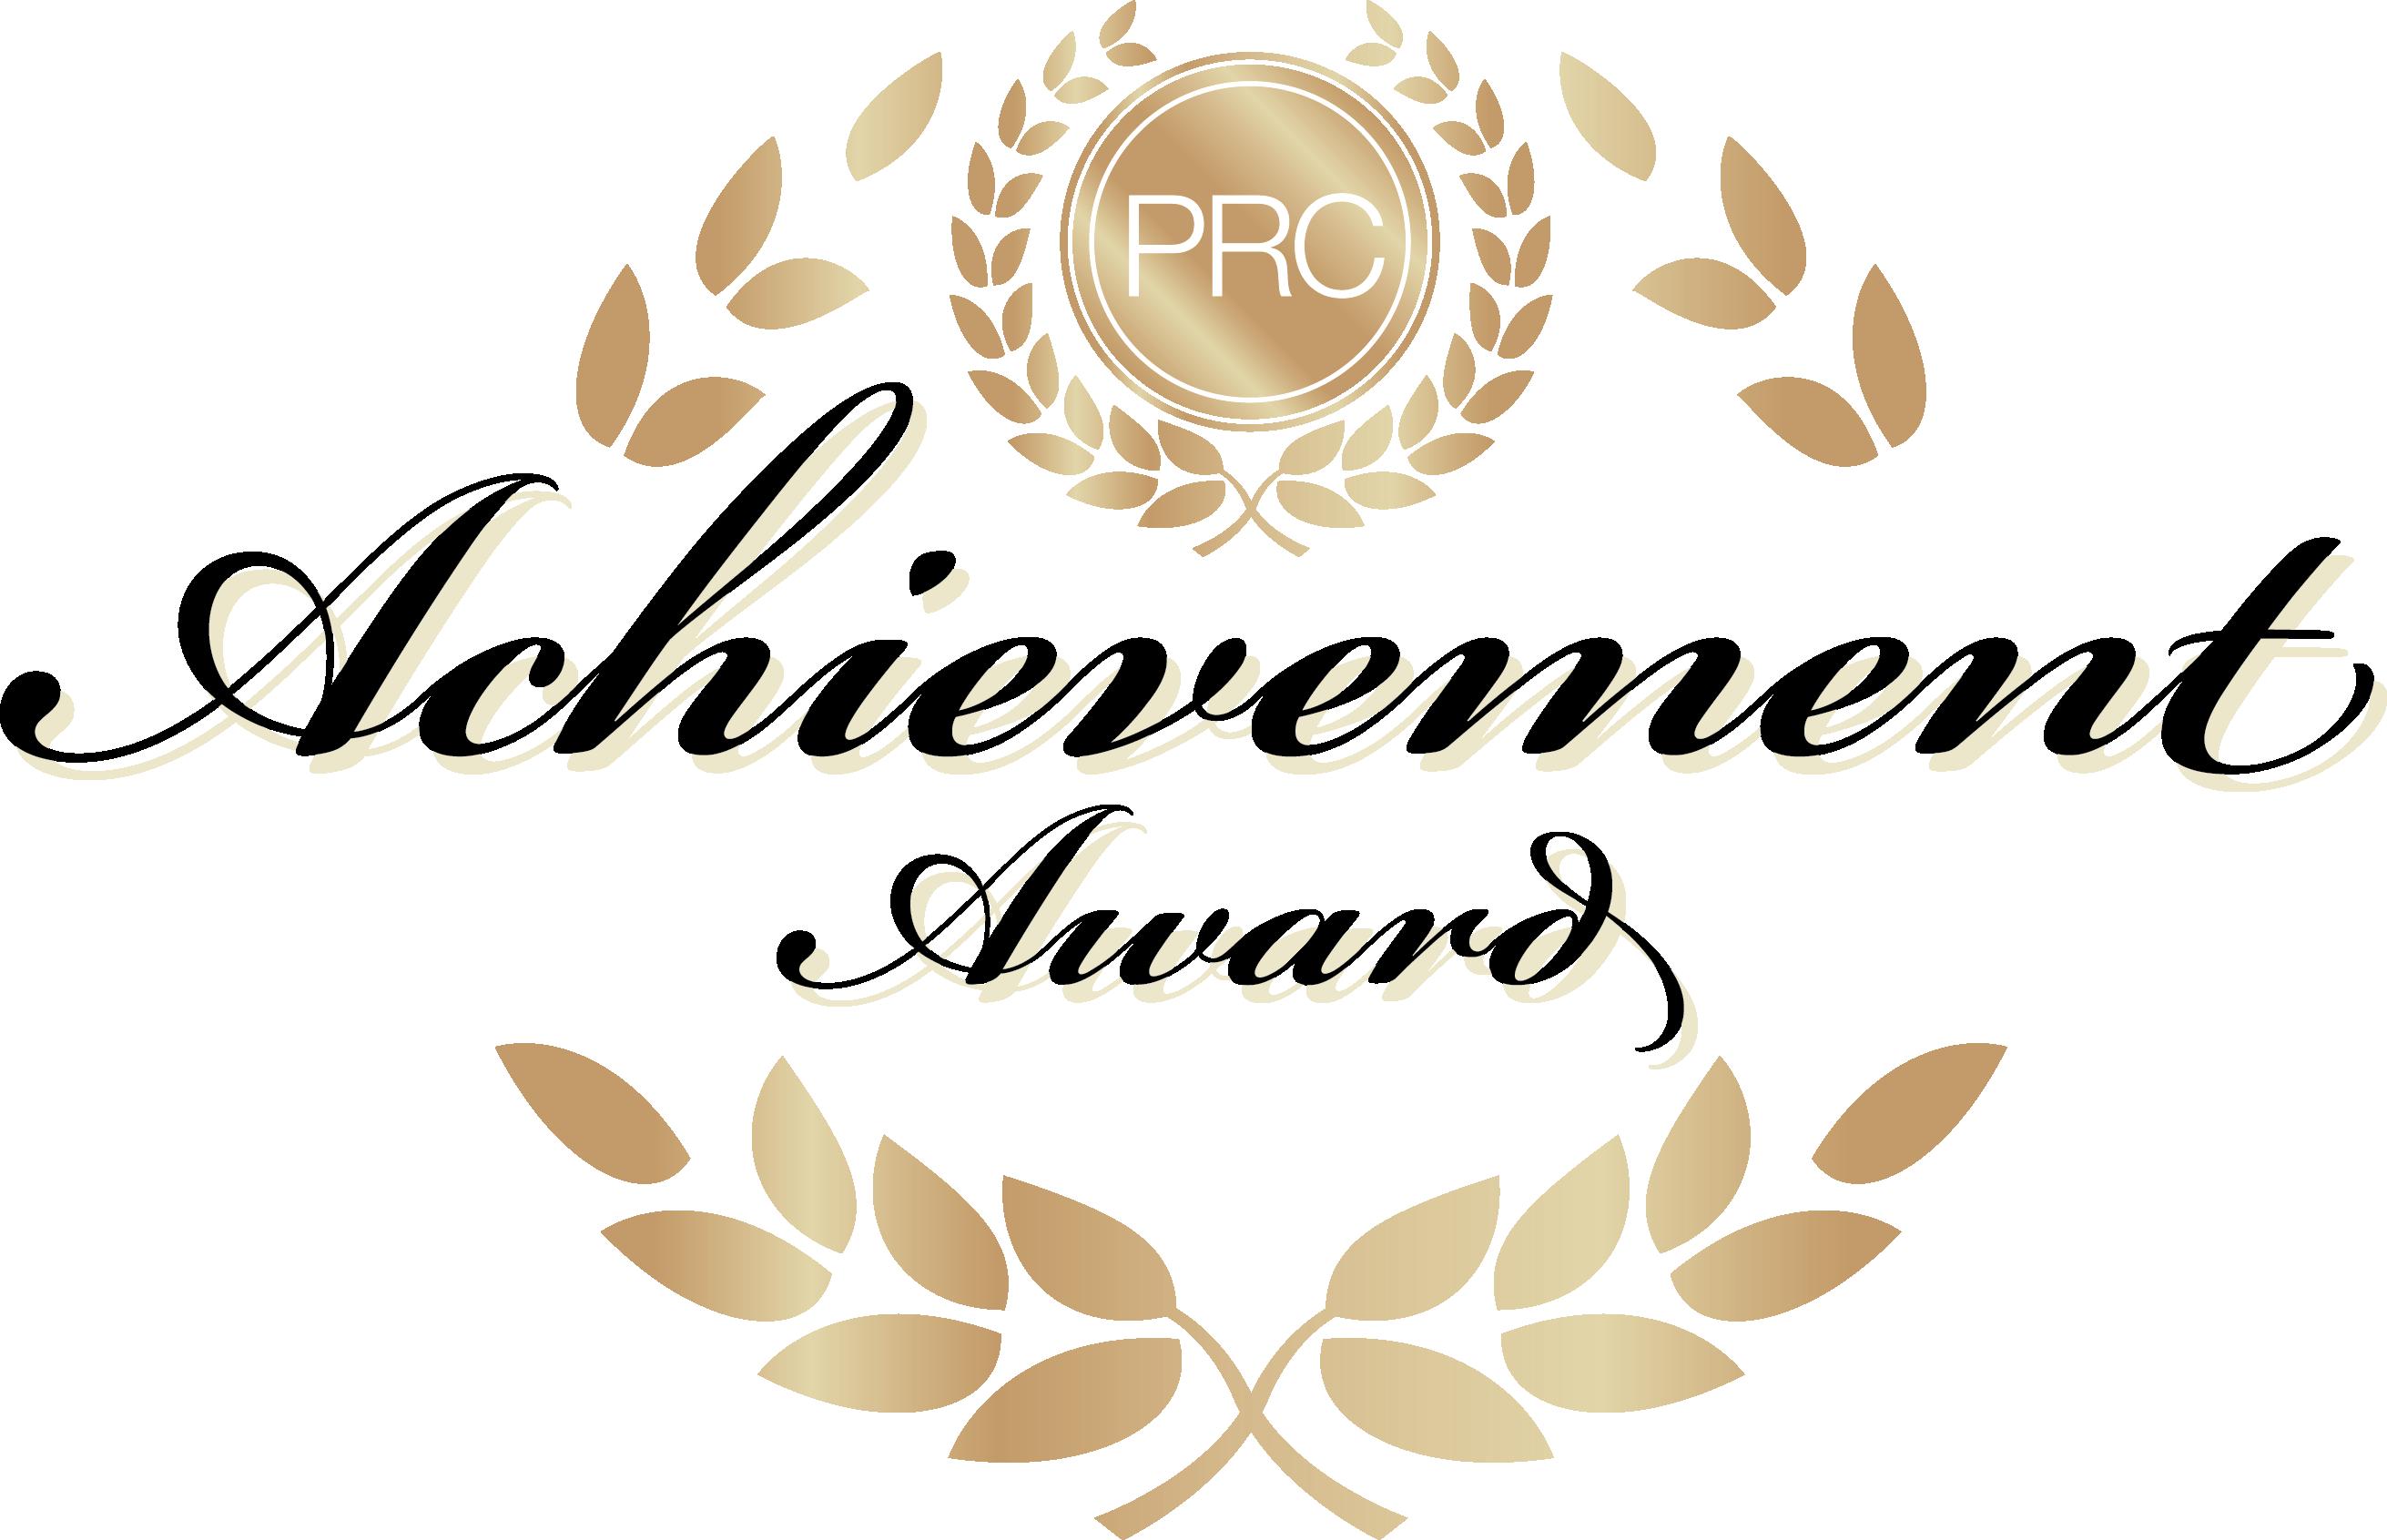 Achieve_Award_logo.png